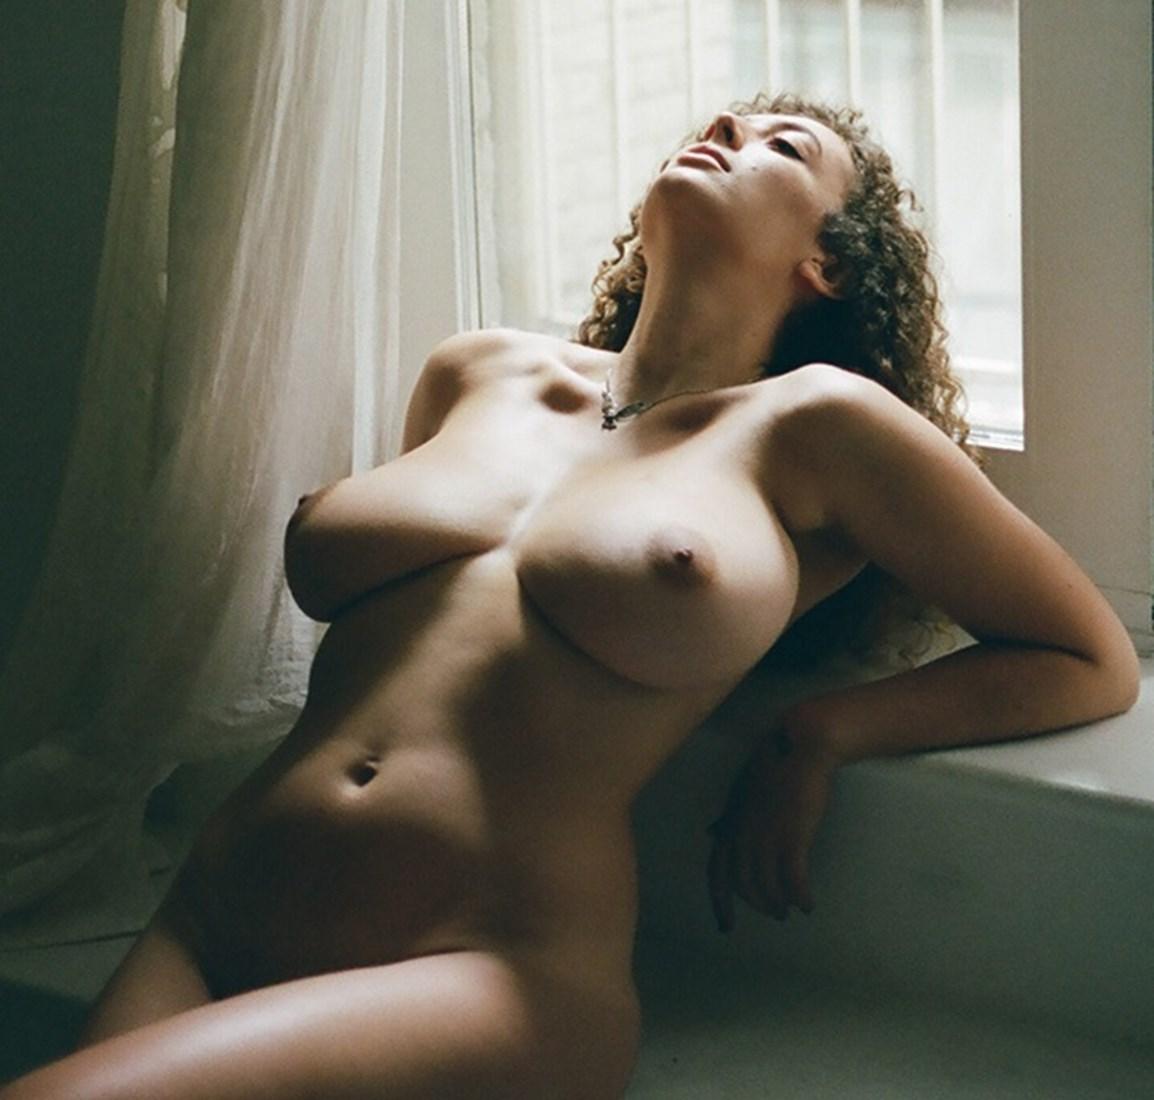 Brüste nackt lowfire leila Leila lowfire